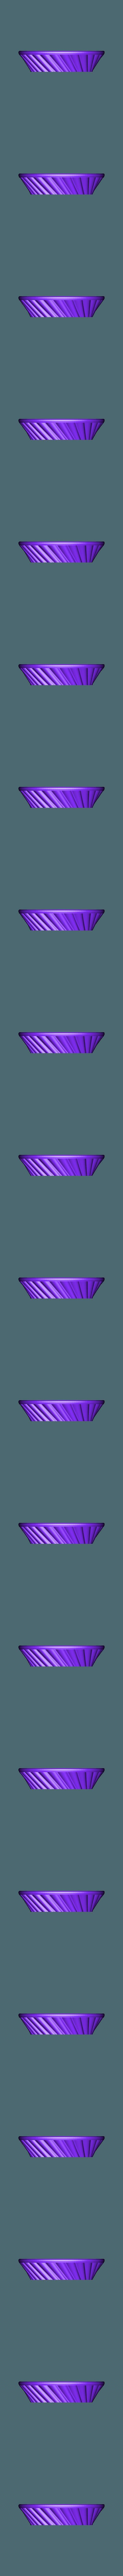 plp-arbre-pot-a-billes.stl Download STL file PLP LUCKY TREE 13 • 3D printable design, PLP